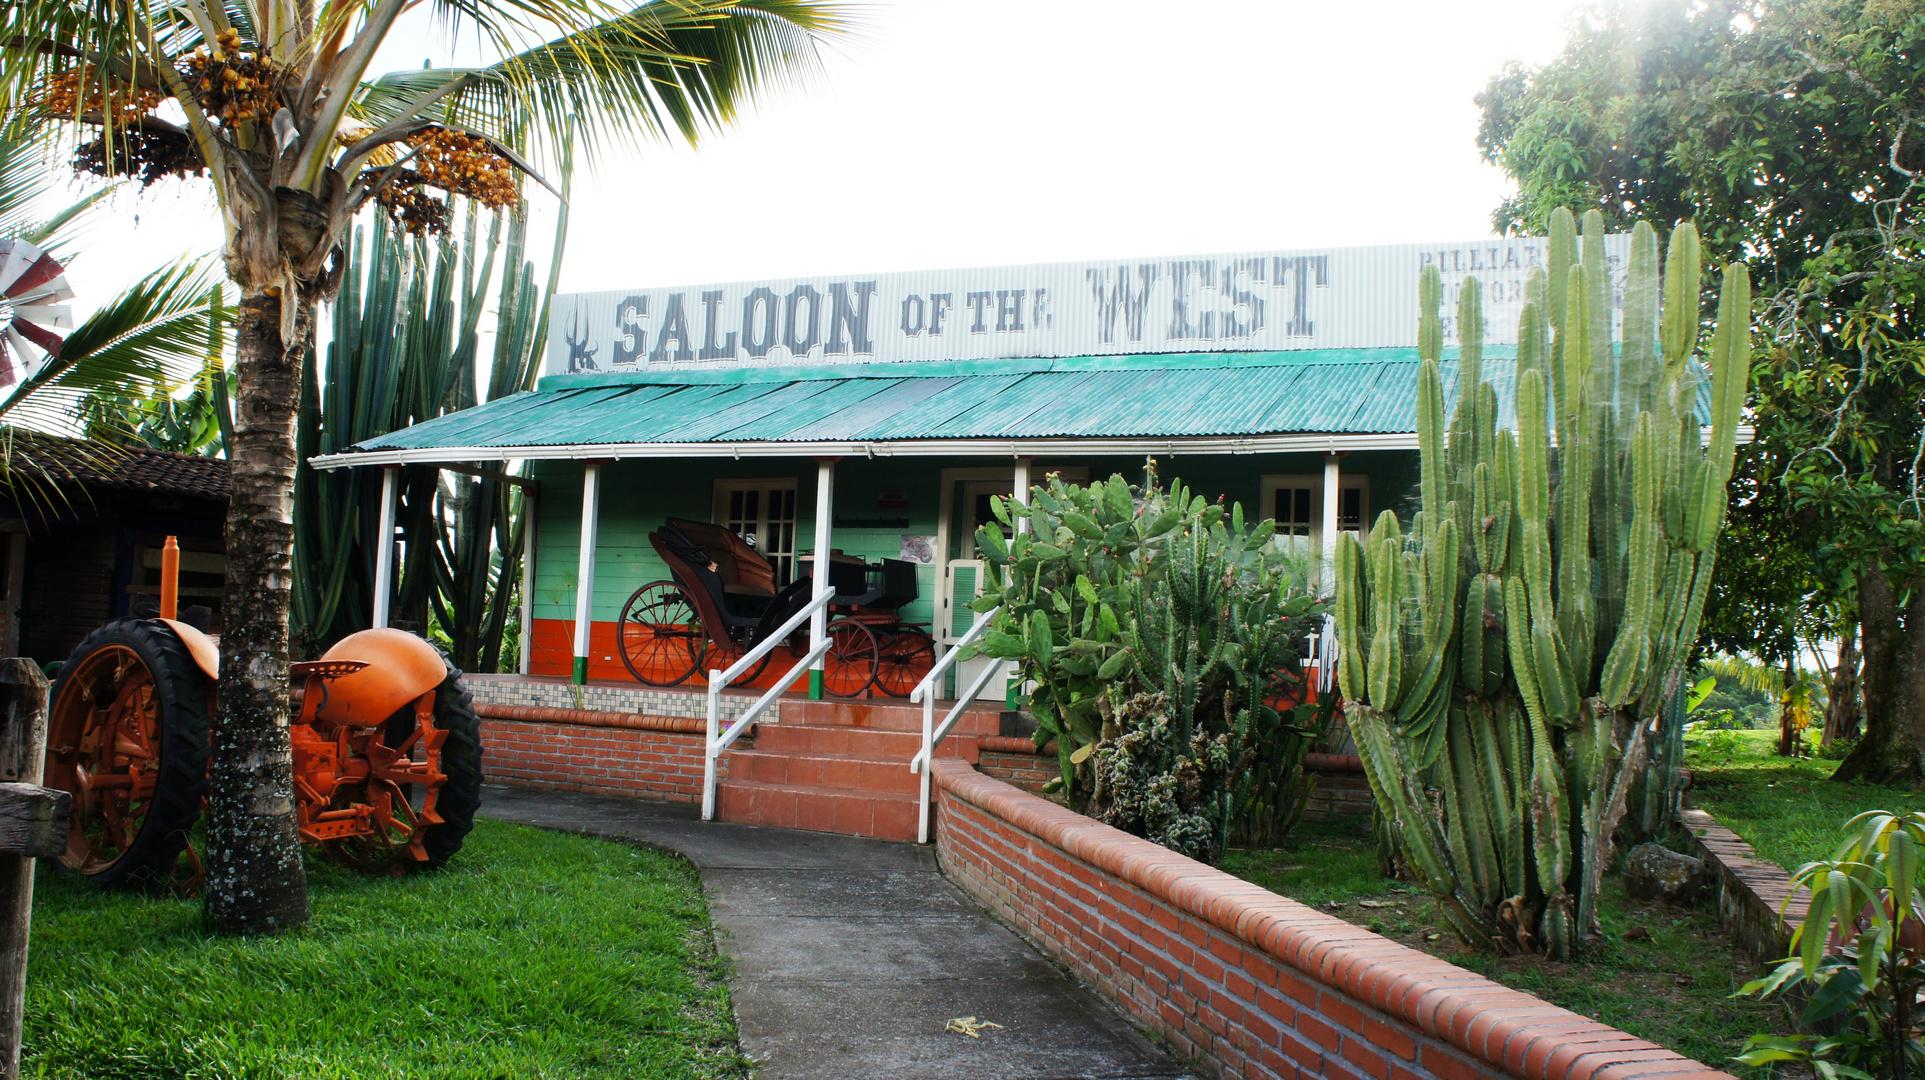 SALOON OF THE WEST - FINCA EN VENTA, PEREIRA COLOMBIA